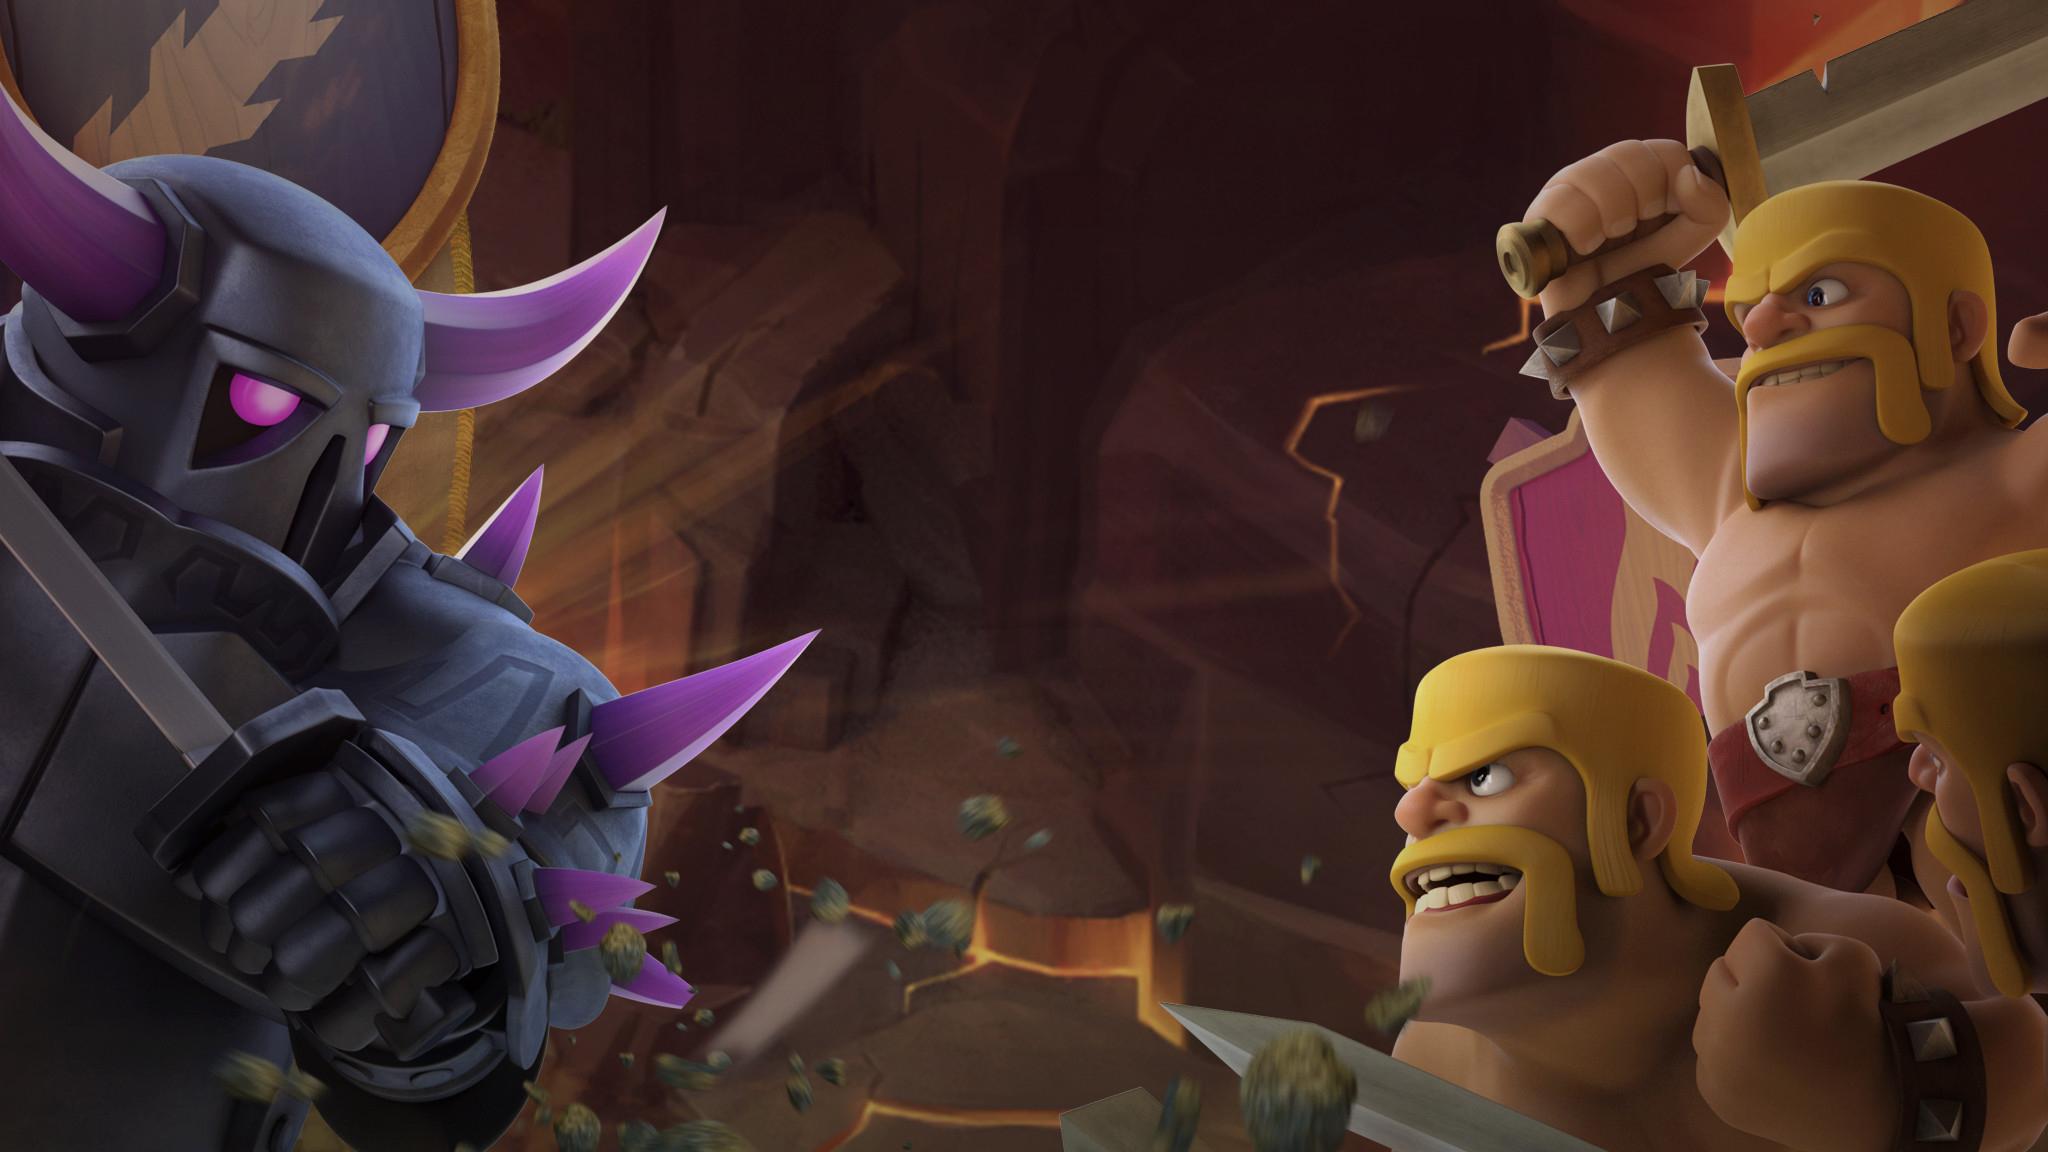 Barbarian Vs Pekka Clash Of Clans Hd Games 4k Wallpapers Images